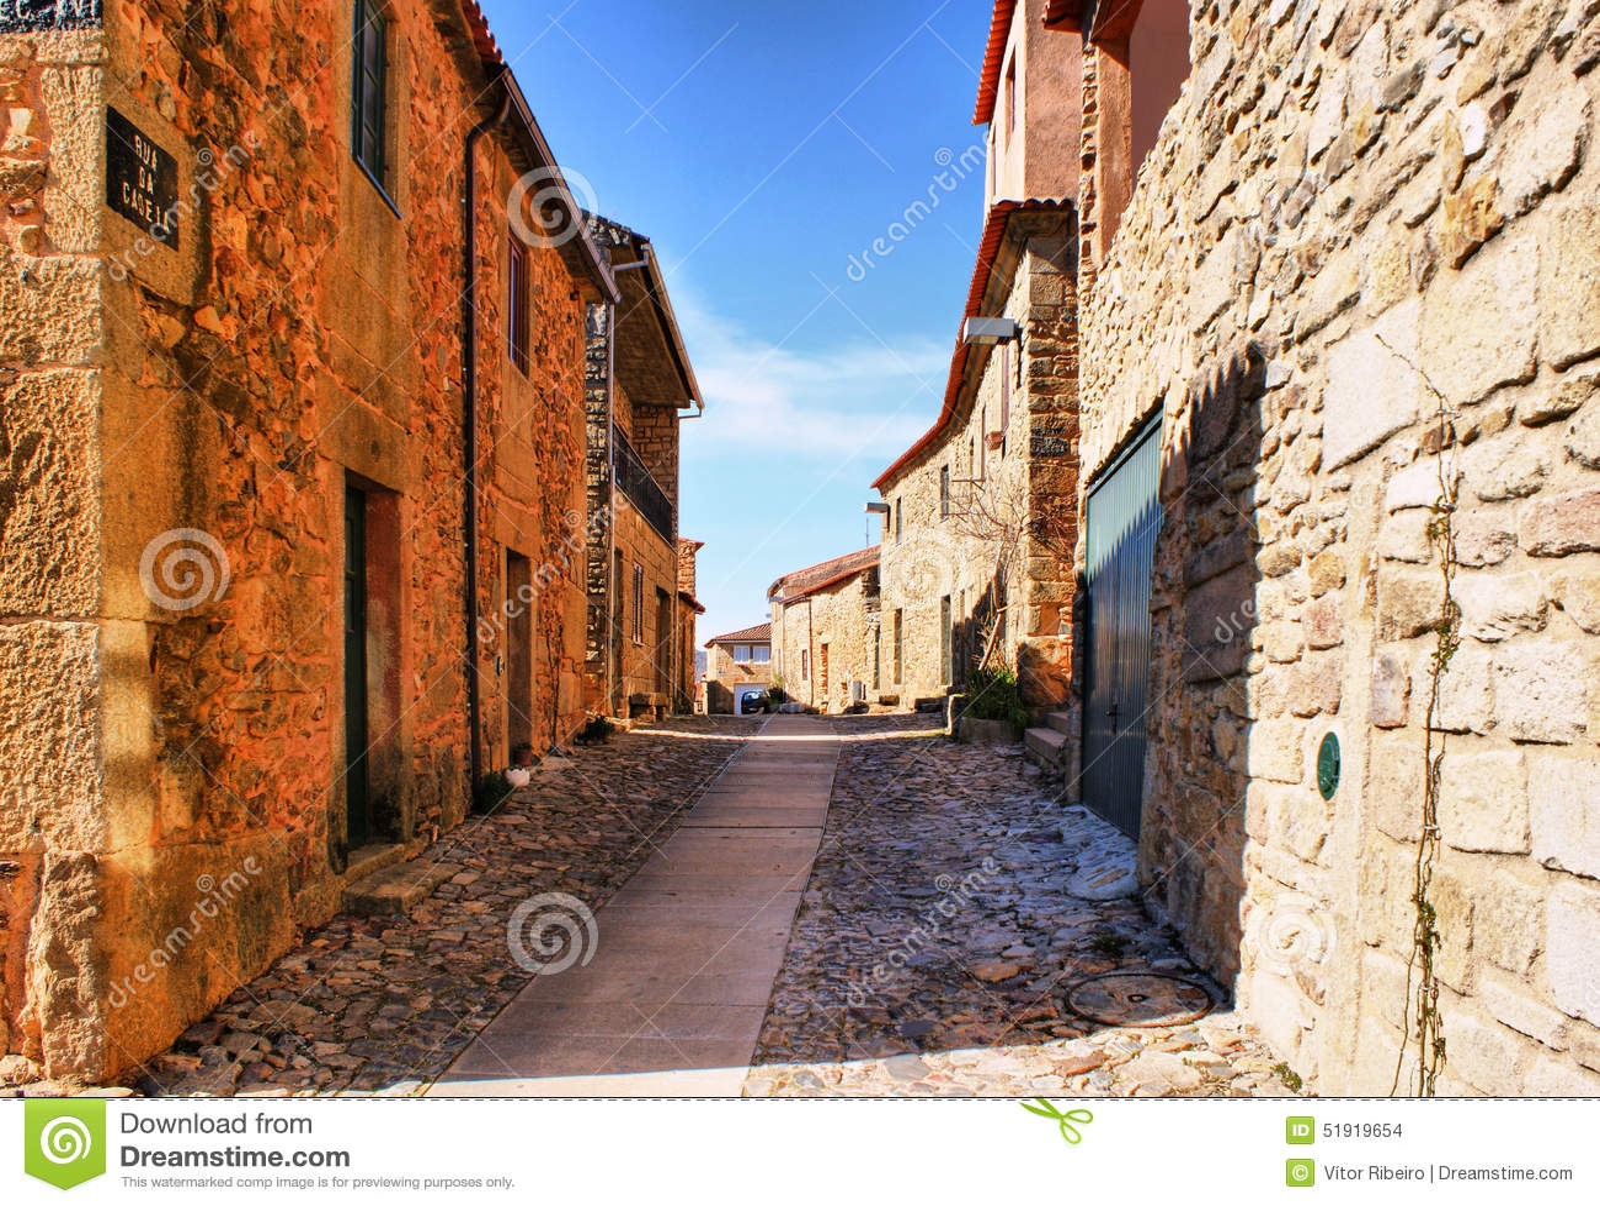 Castelo Rodrigo historical village